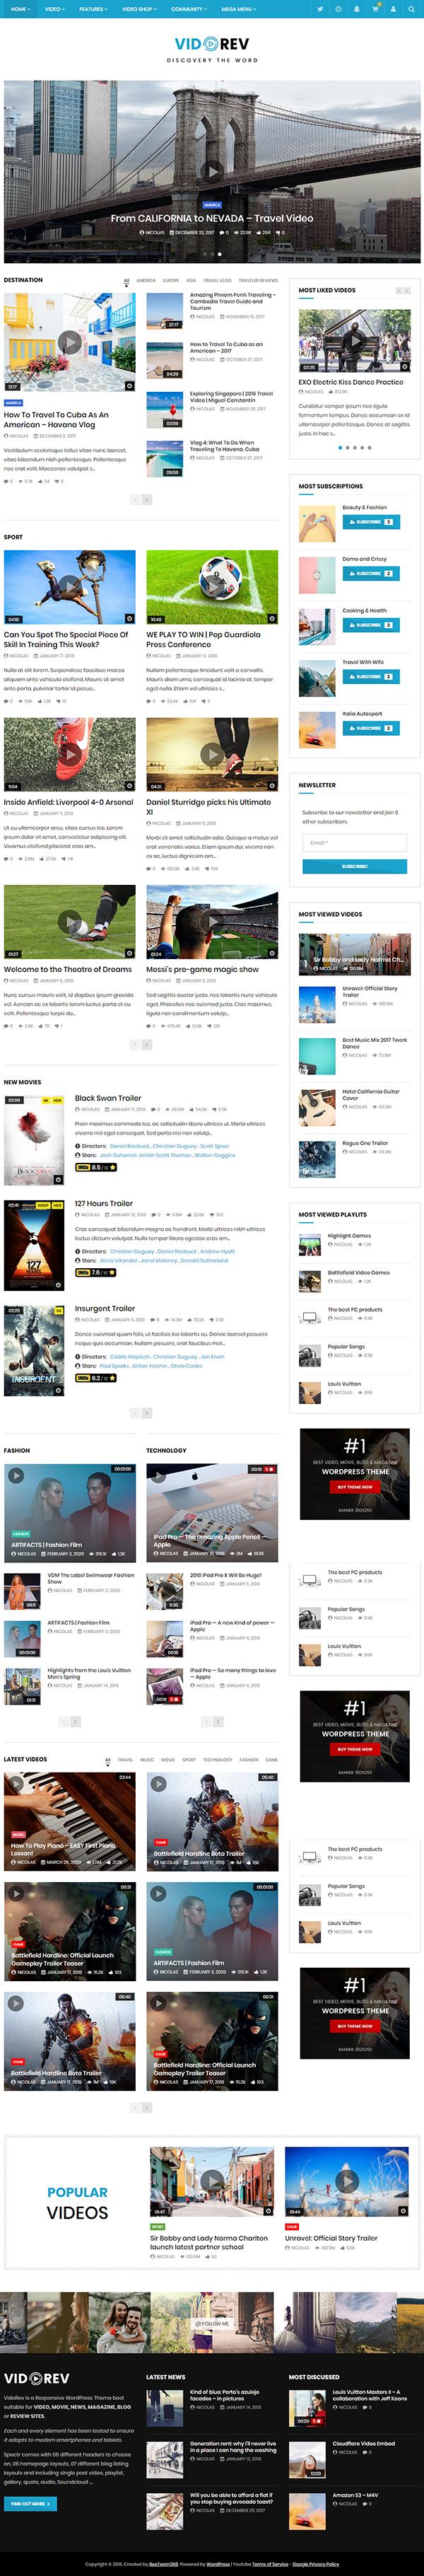 VidoRev - Video WordPress Theme